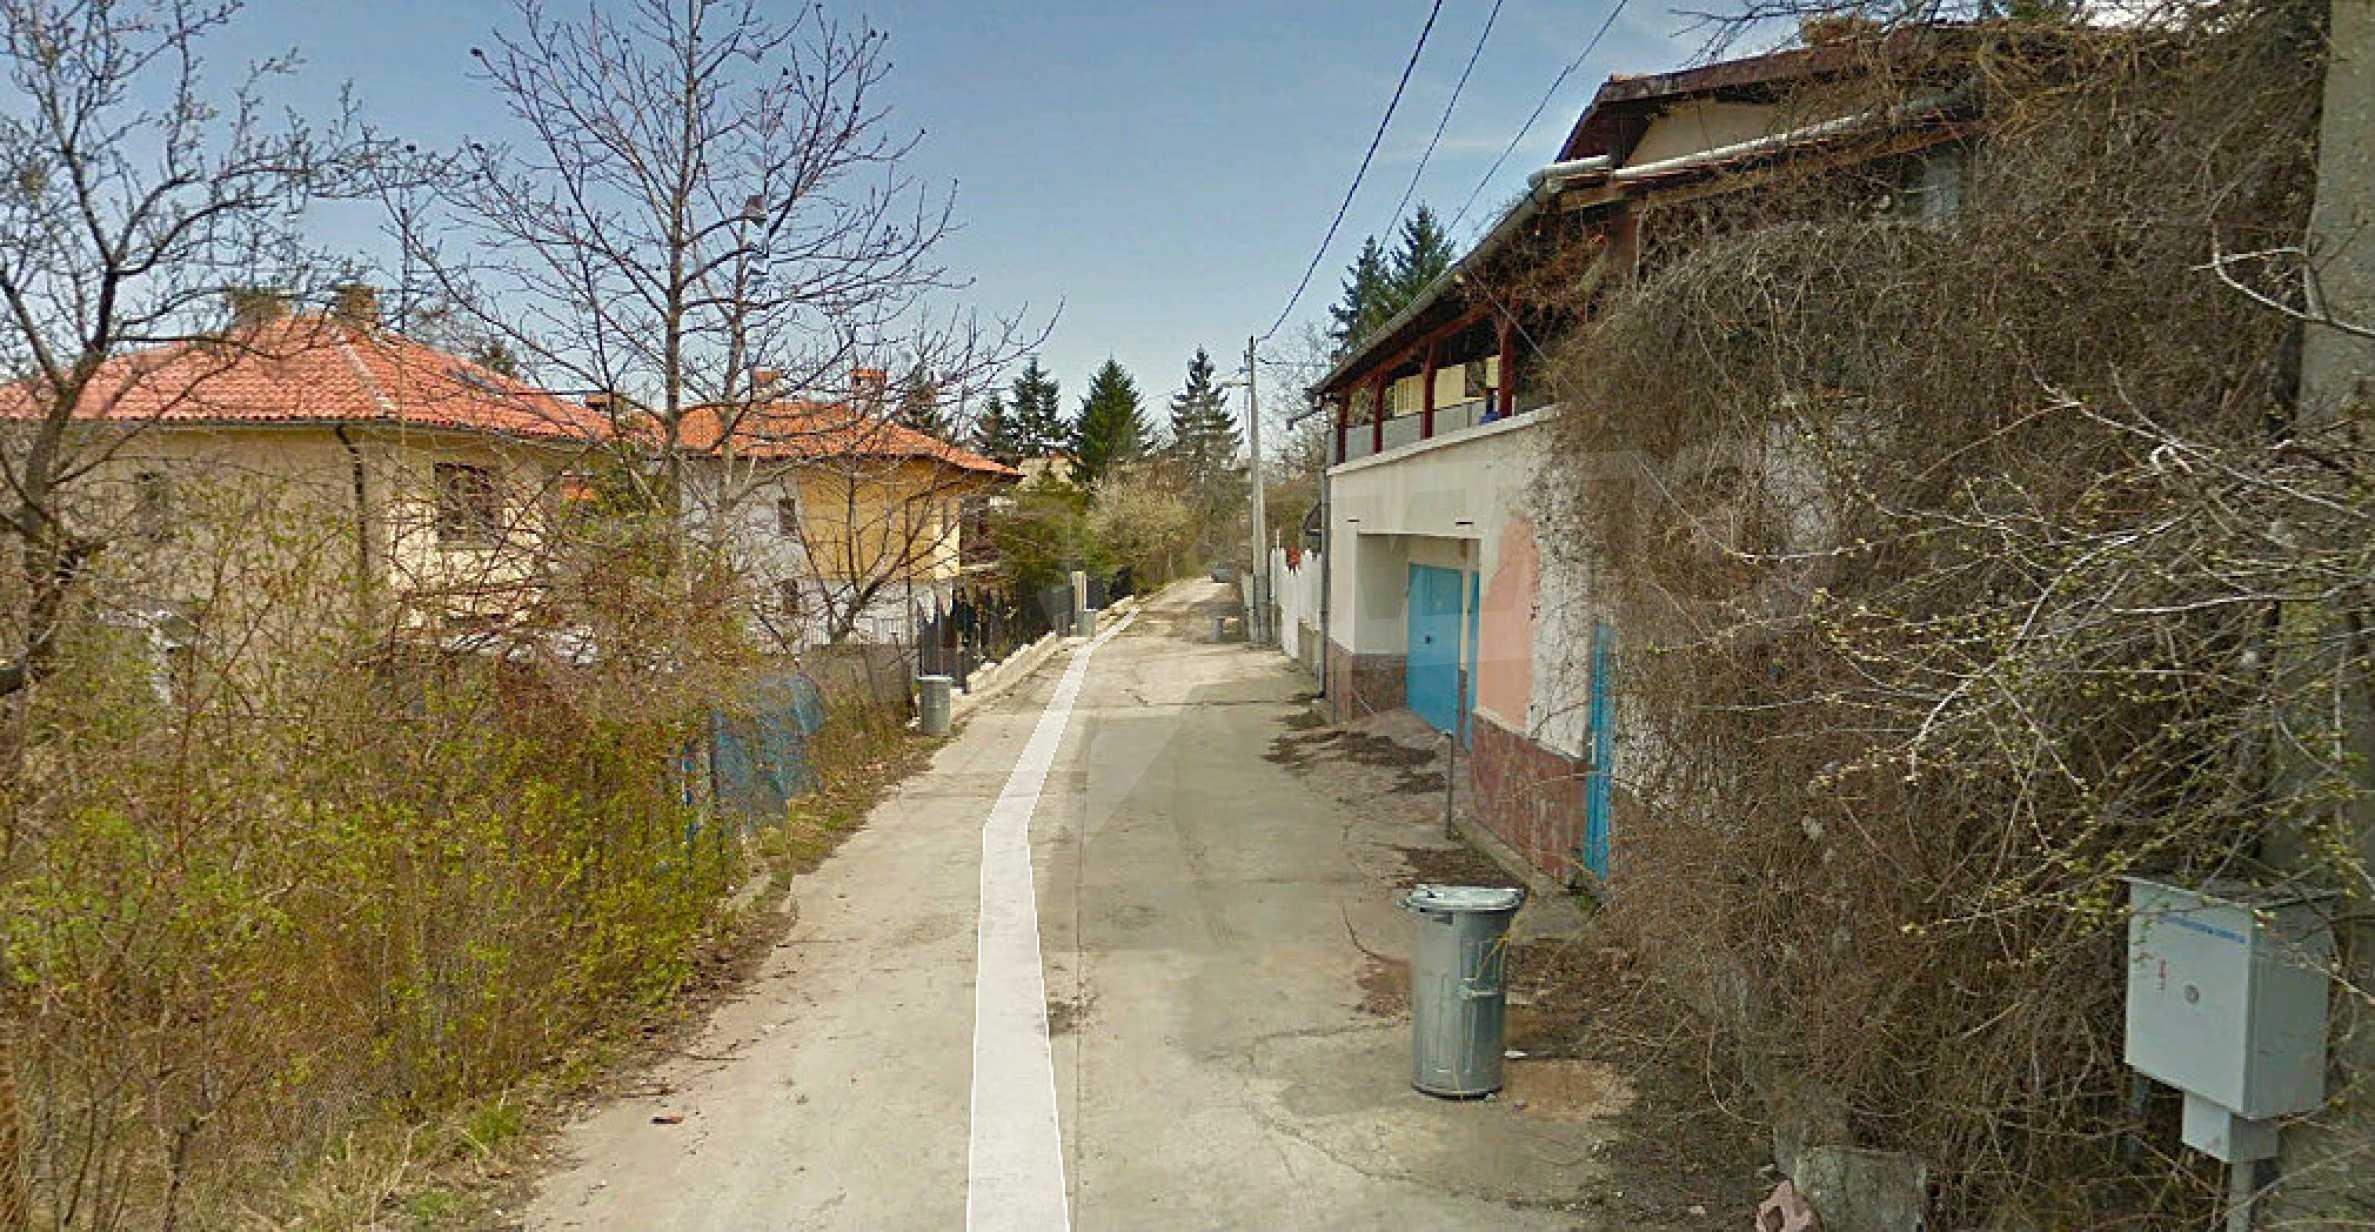 Baugrundstück zu verkaufen im Stadtteil Gradoman 4